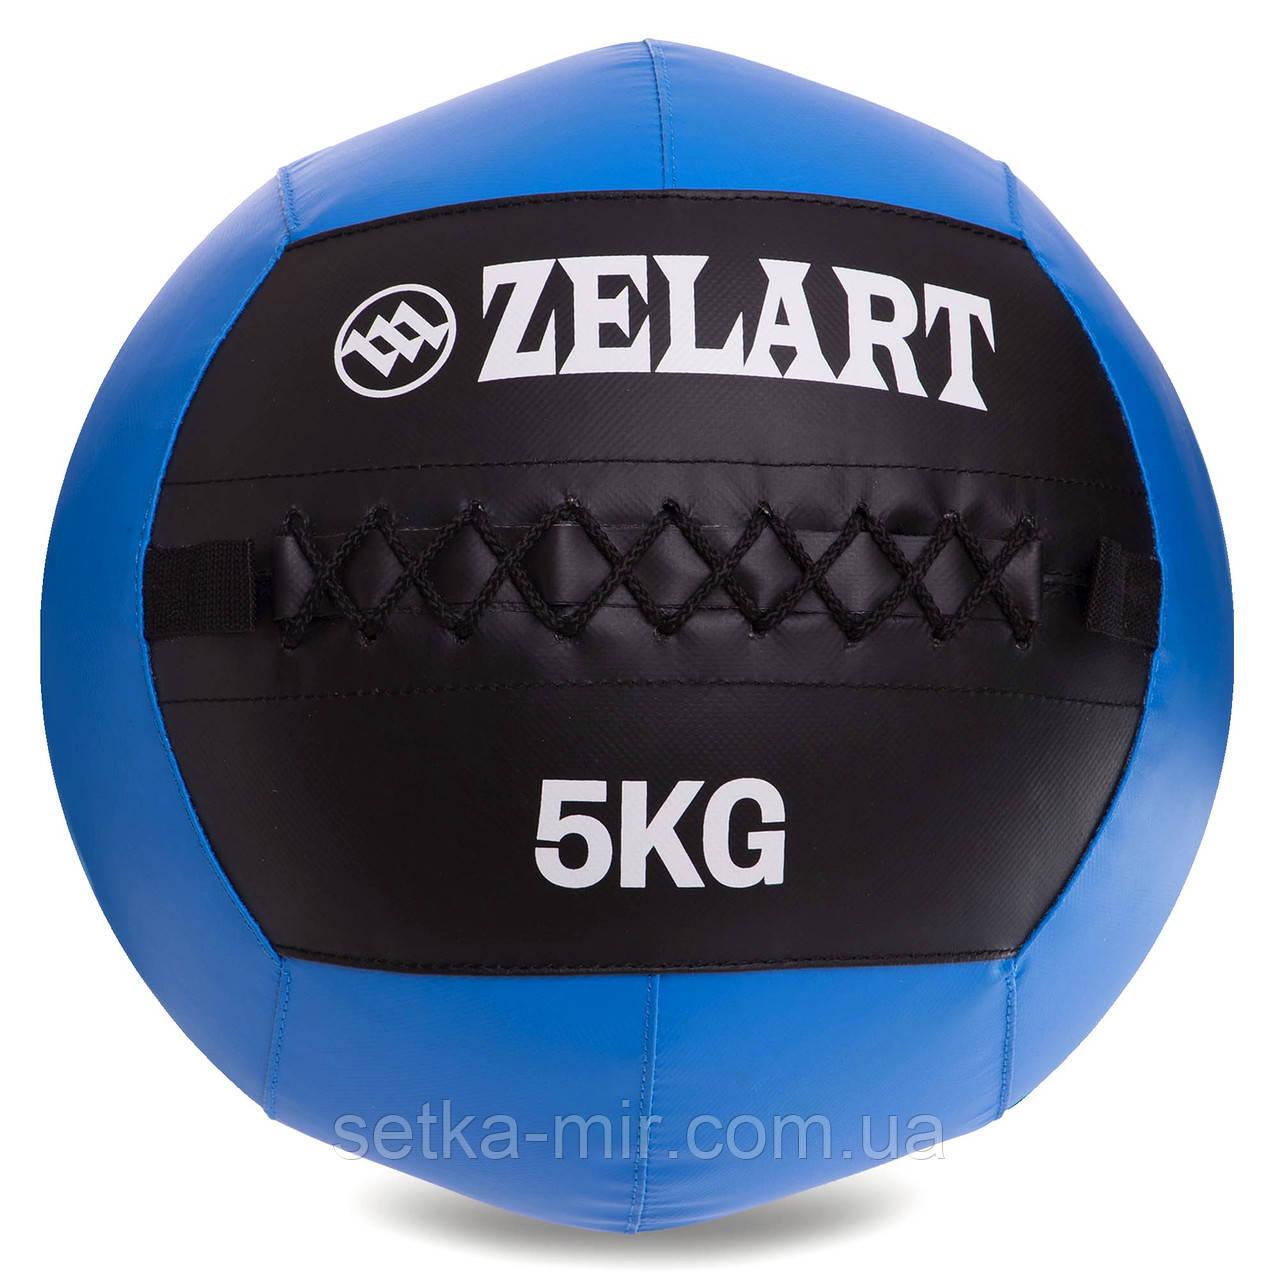 Мяч волбол для кроссфита и фитнеса 5кг Zelart WALL BALL FI-5168-5